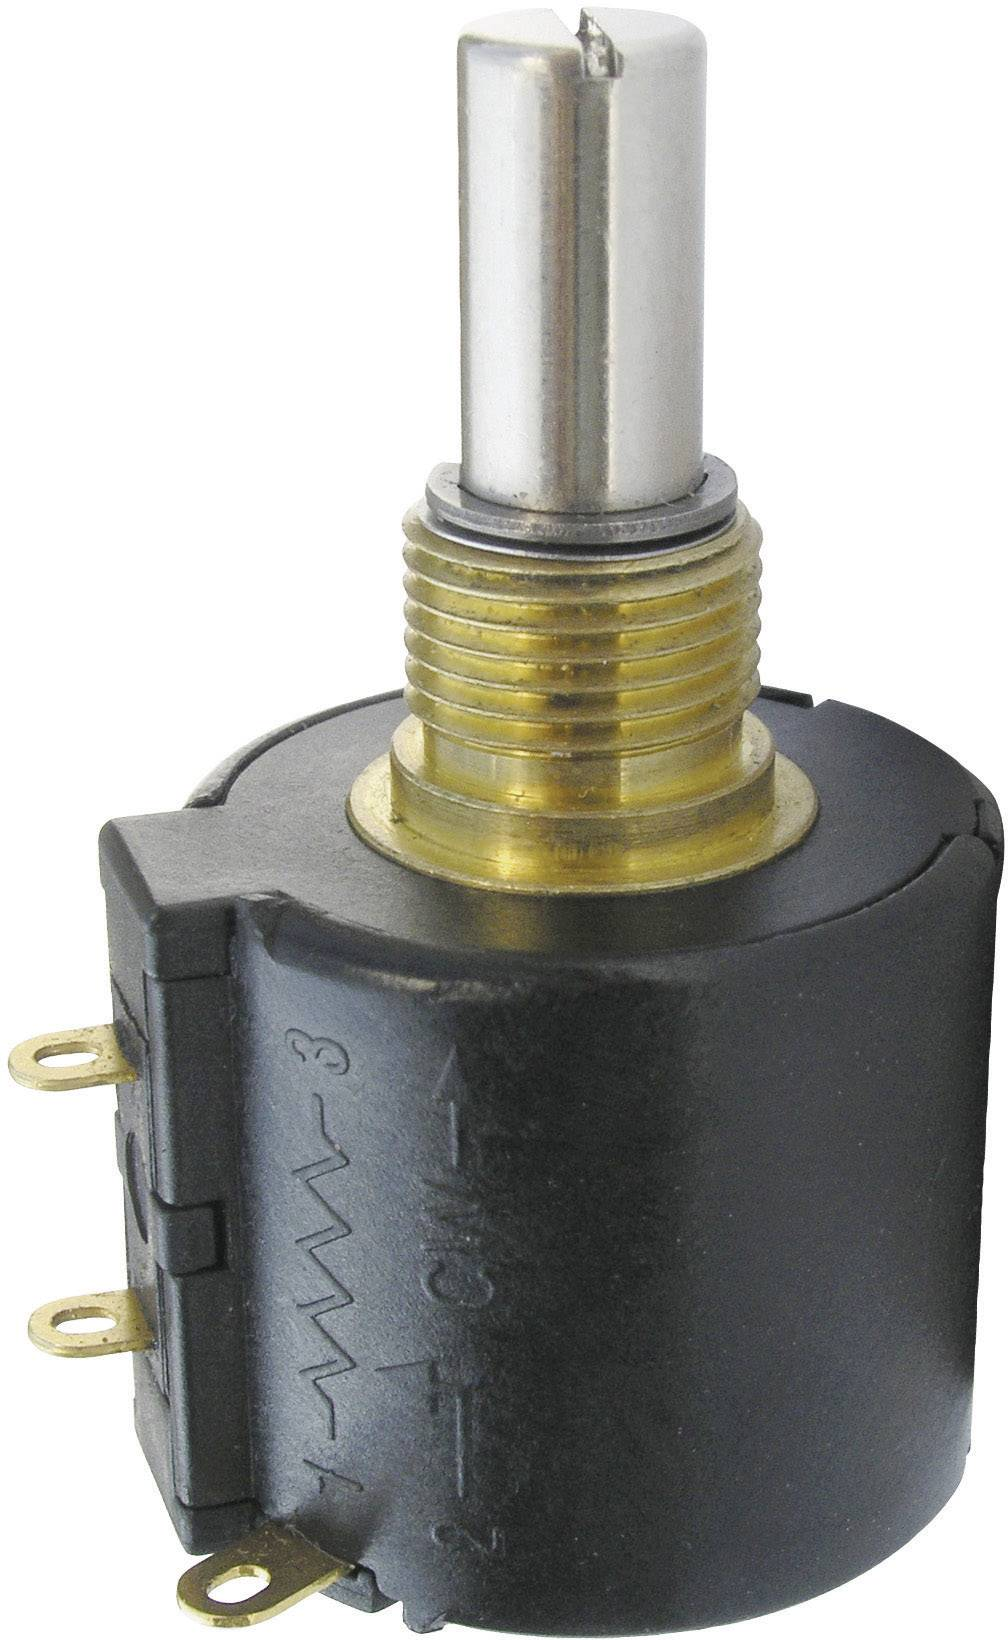 Presný potenciometer Wirewound, 10-cestný mono Bourns 3549S-1AA-203A 3549S-1AA-203A, 2 W, 20 kOhm, 1 ks